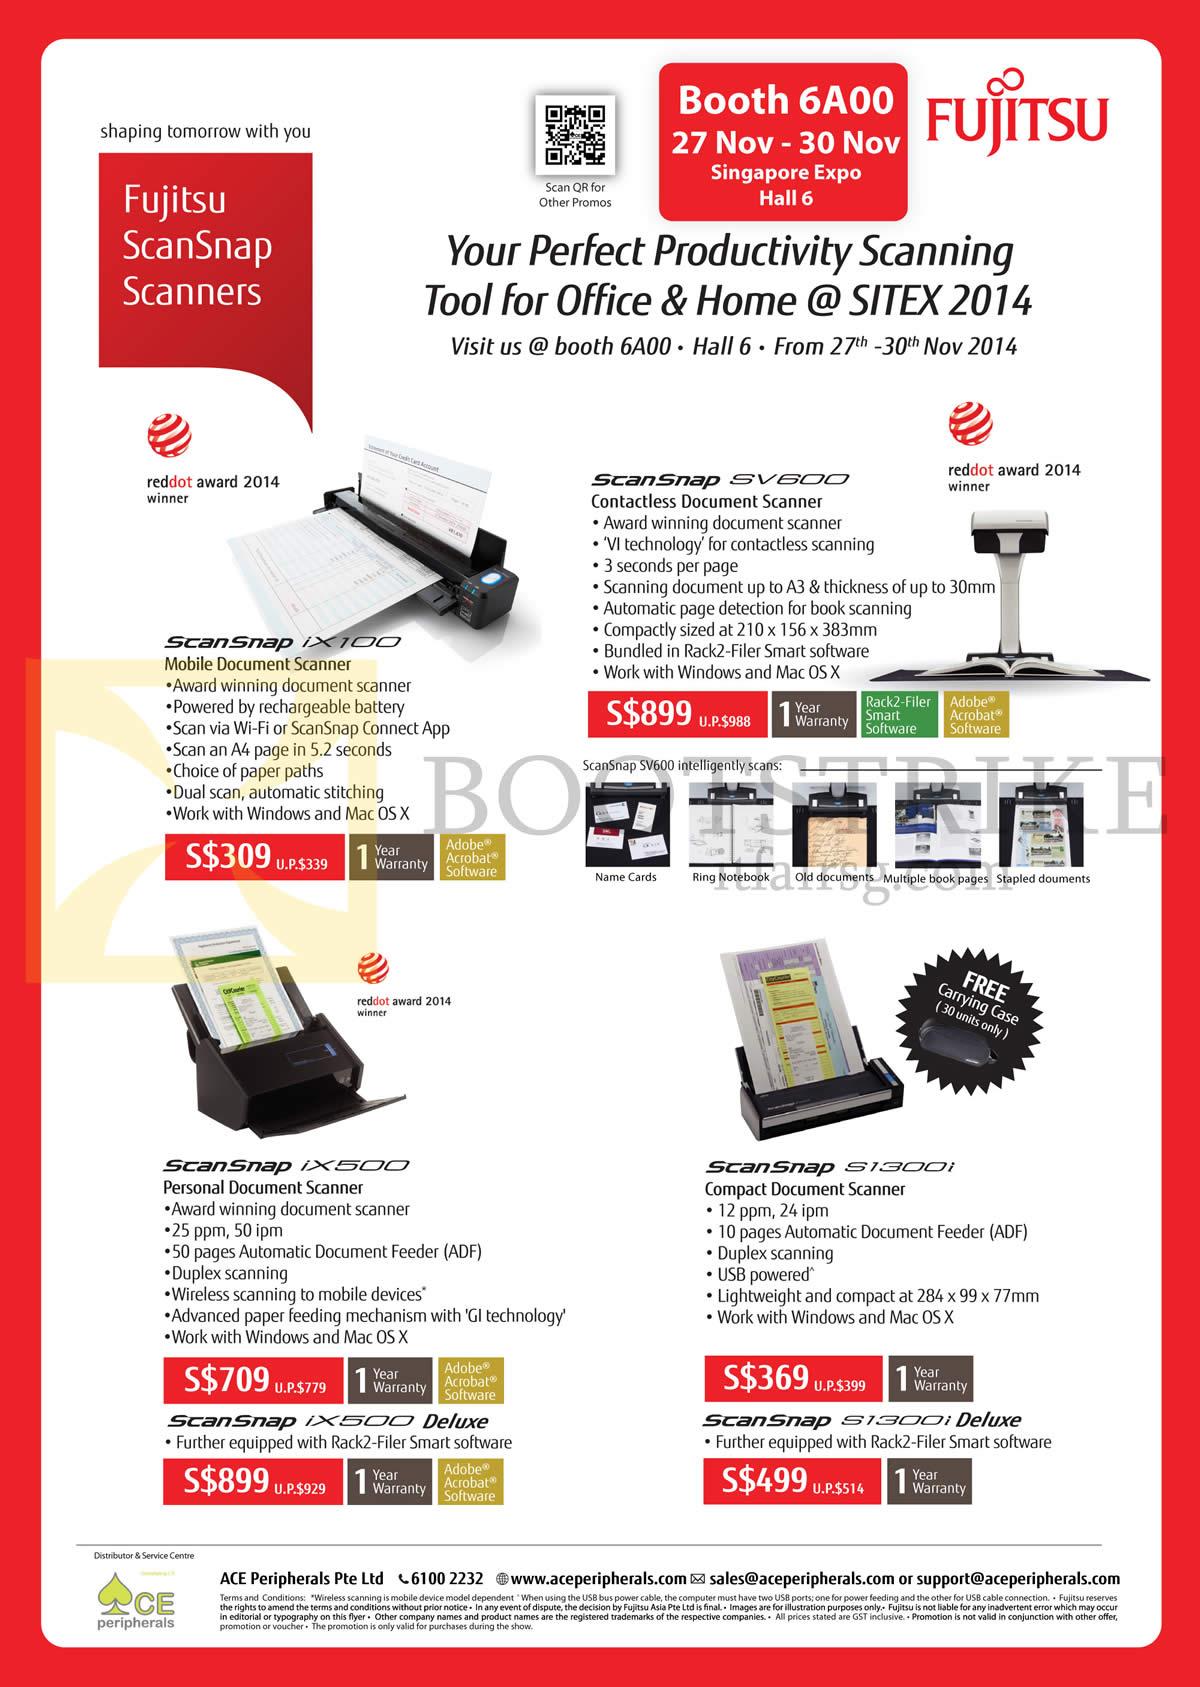 SITEX 2014 price list image brochure of Ace Peripherals Fujitsu Scanners ScanSnap IX100, SV600, IX500, S1300i